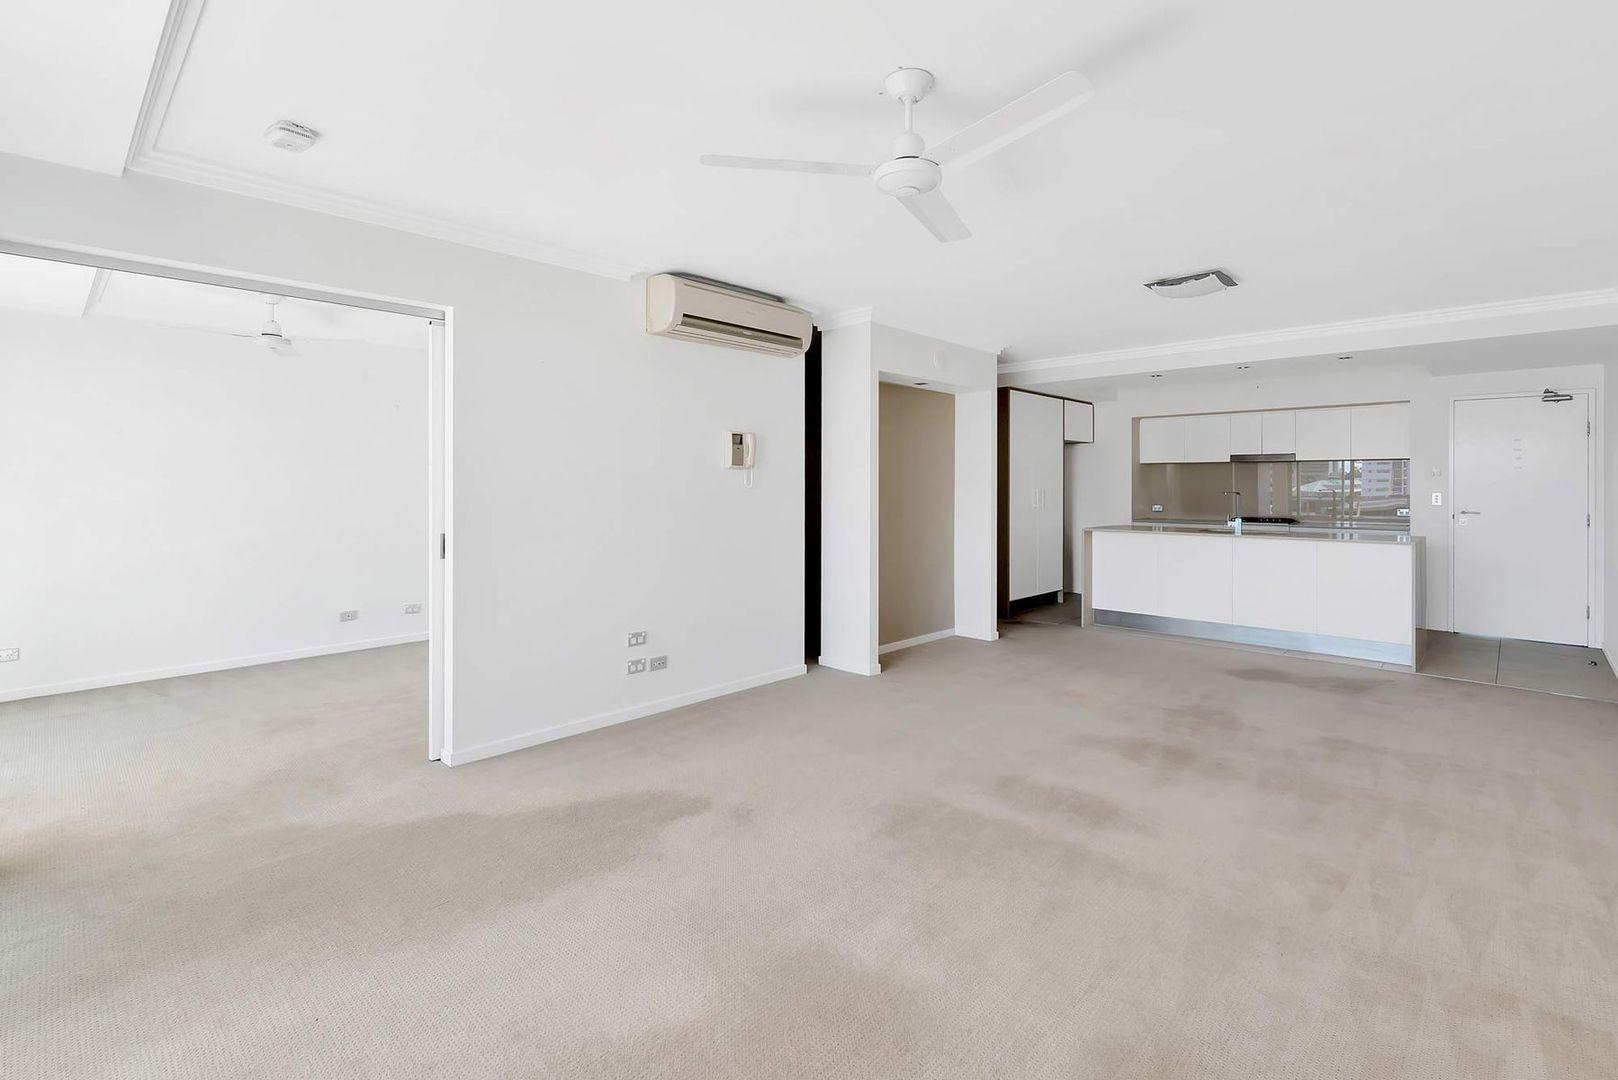 29/53 Darrambal Street, Chevron Island QLD 4217, Image 2